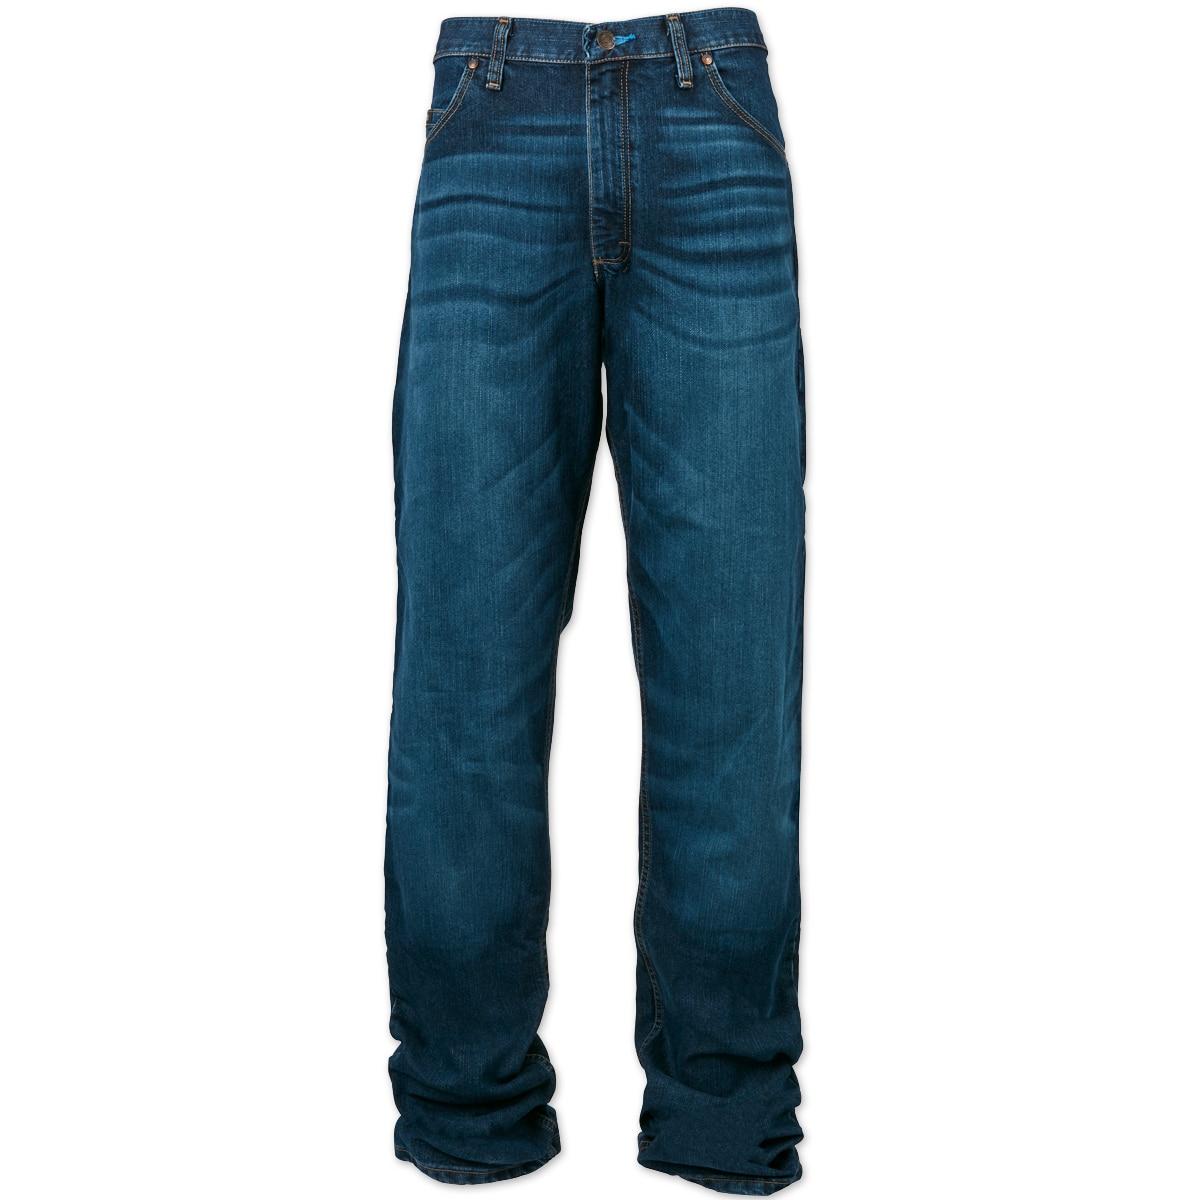 5daa8ba2 Wrangler® Men's 20X Competition Jeans - Cool Vantage